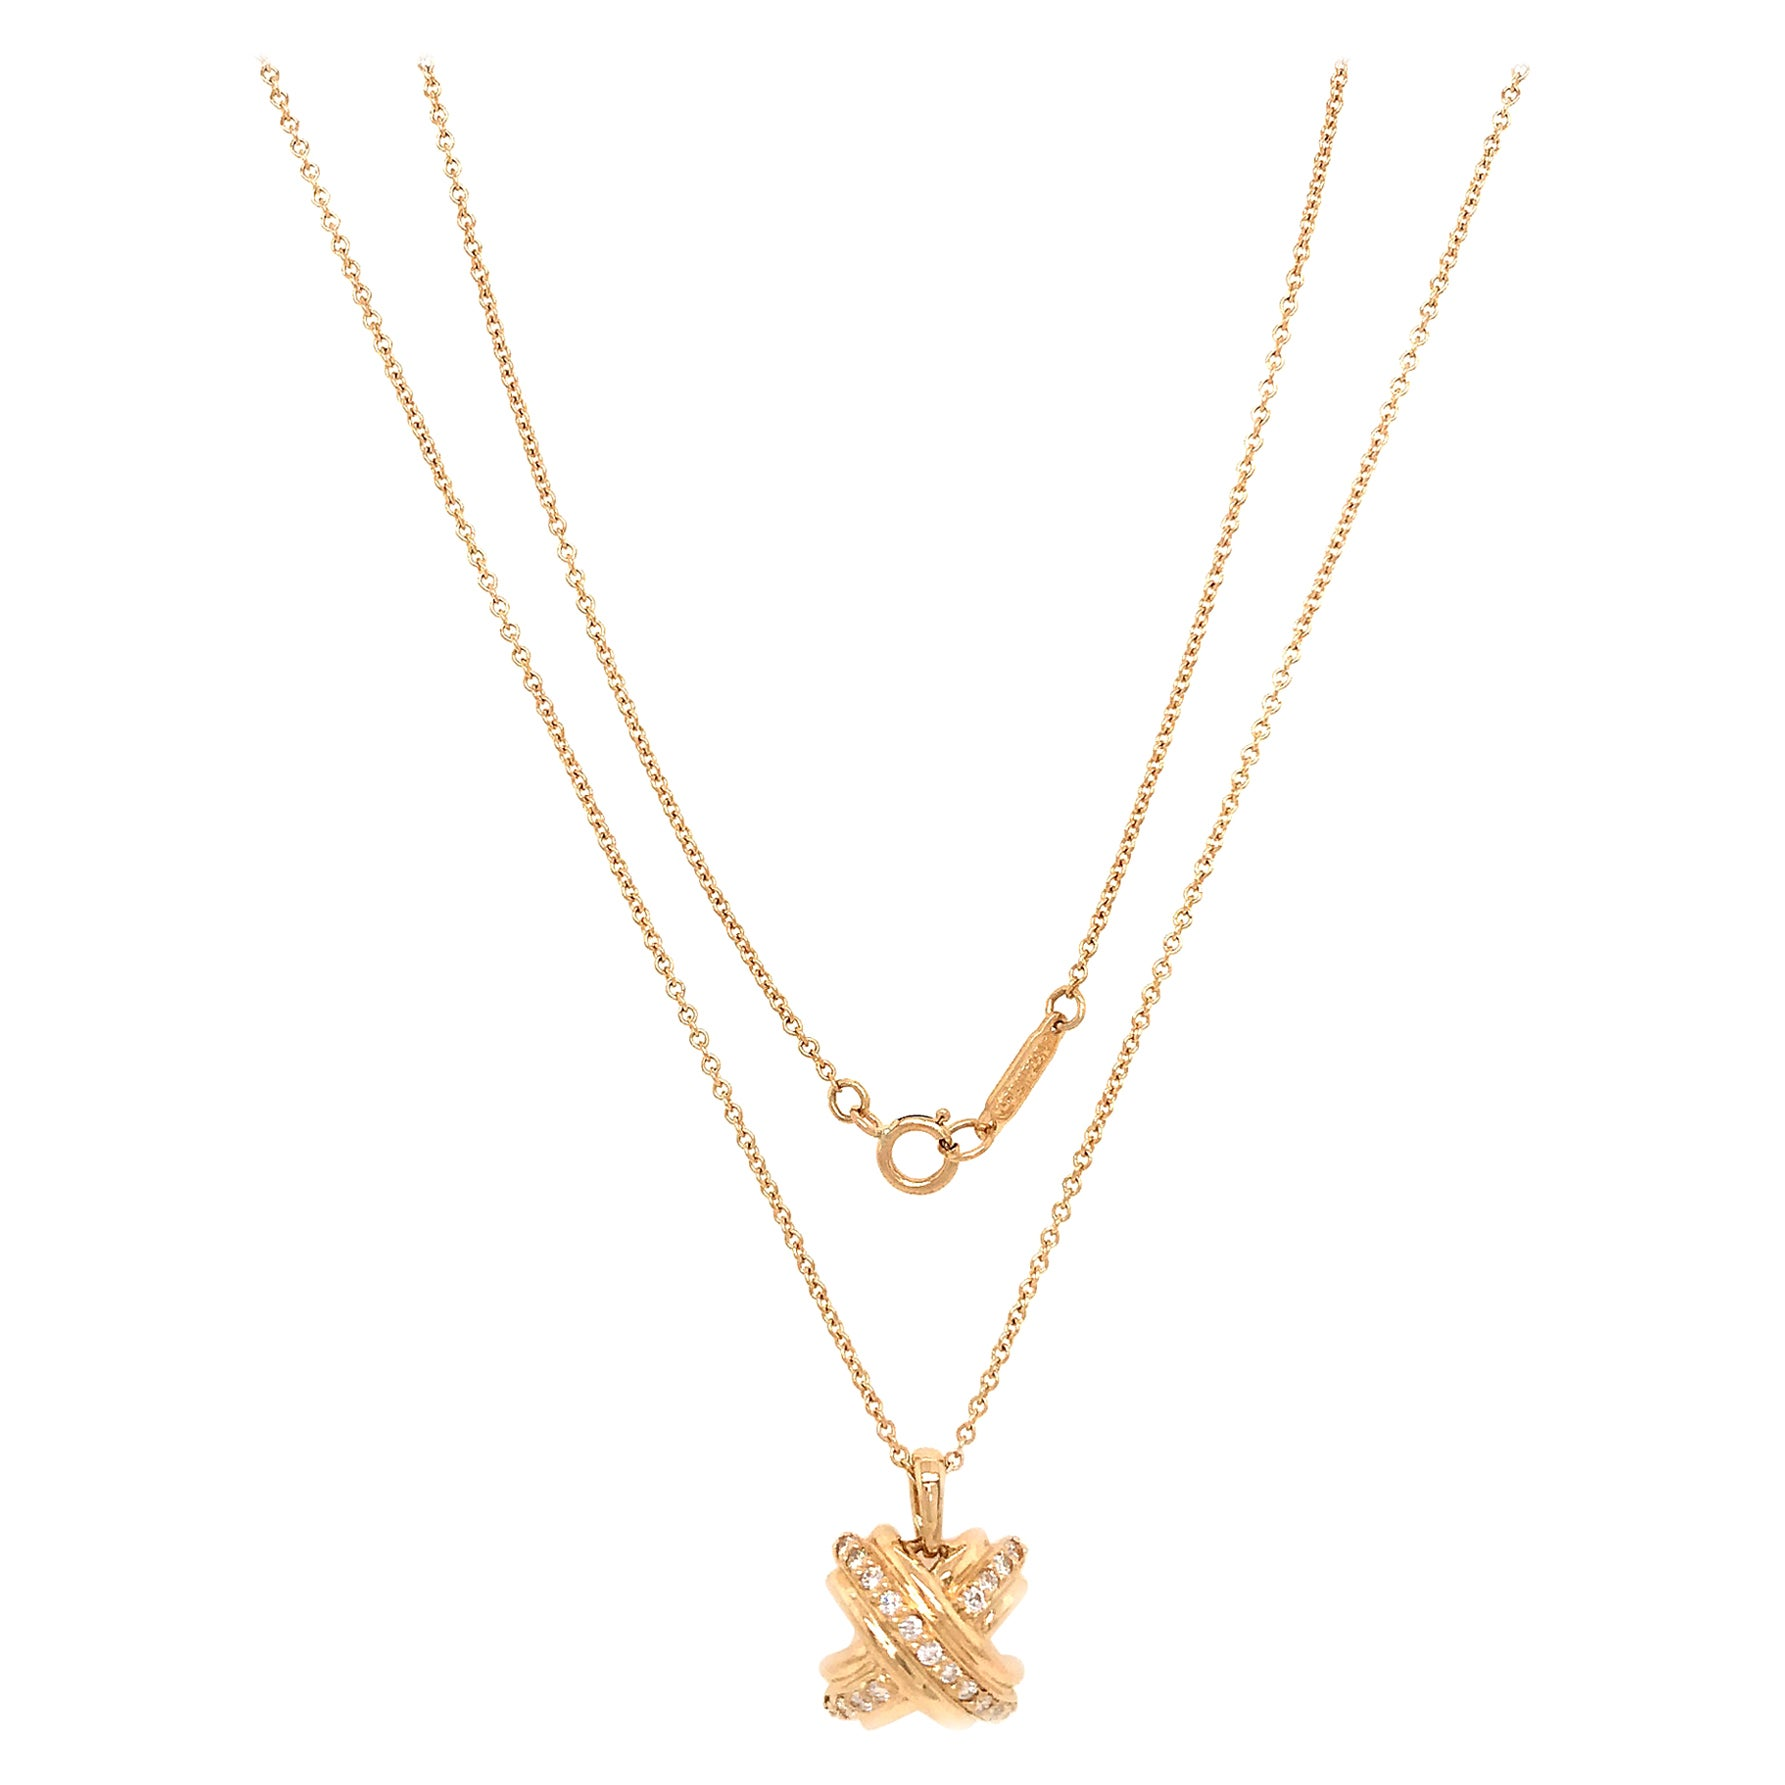 Tiffany & Co. Signature X Diamond Necklace